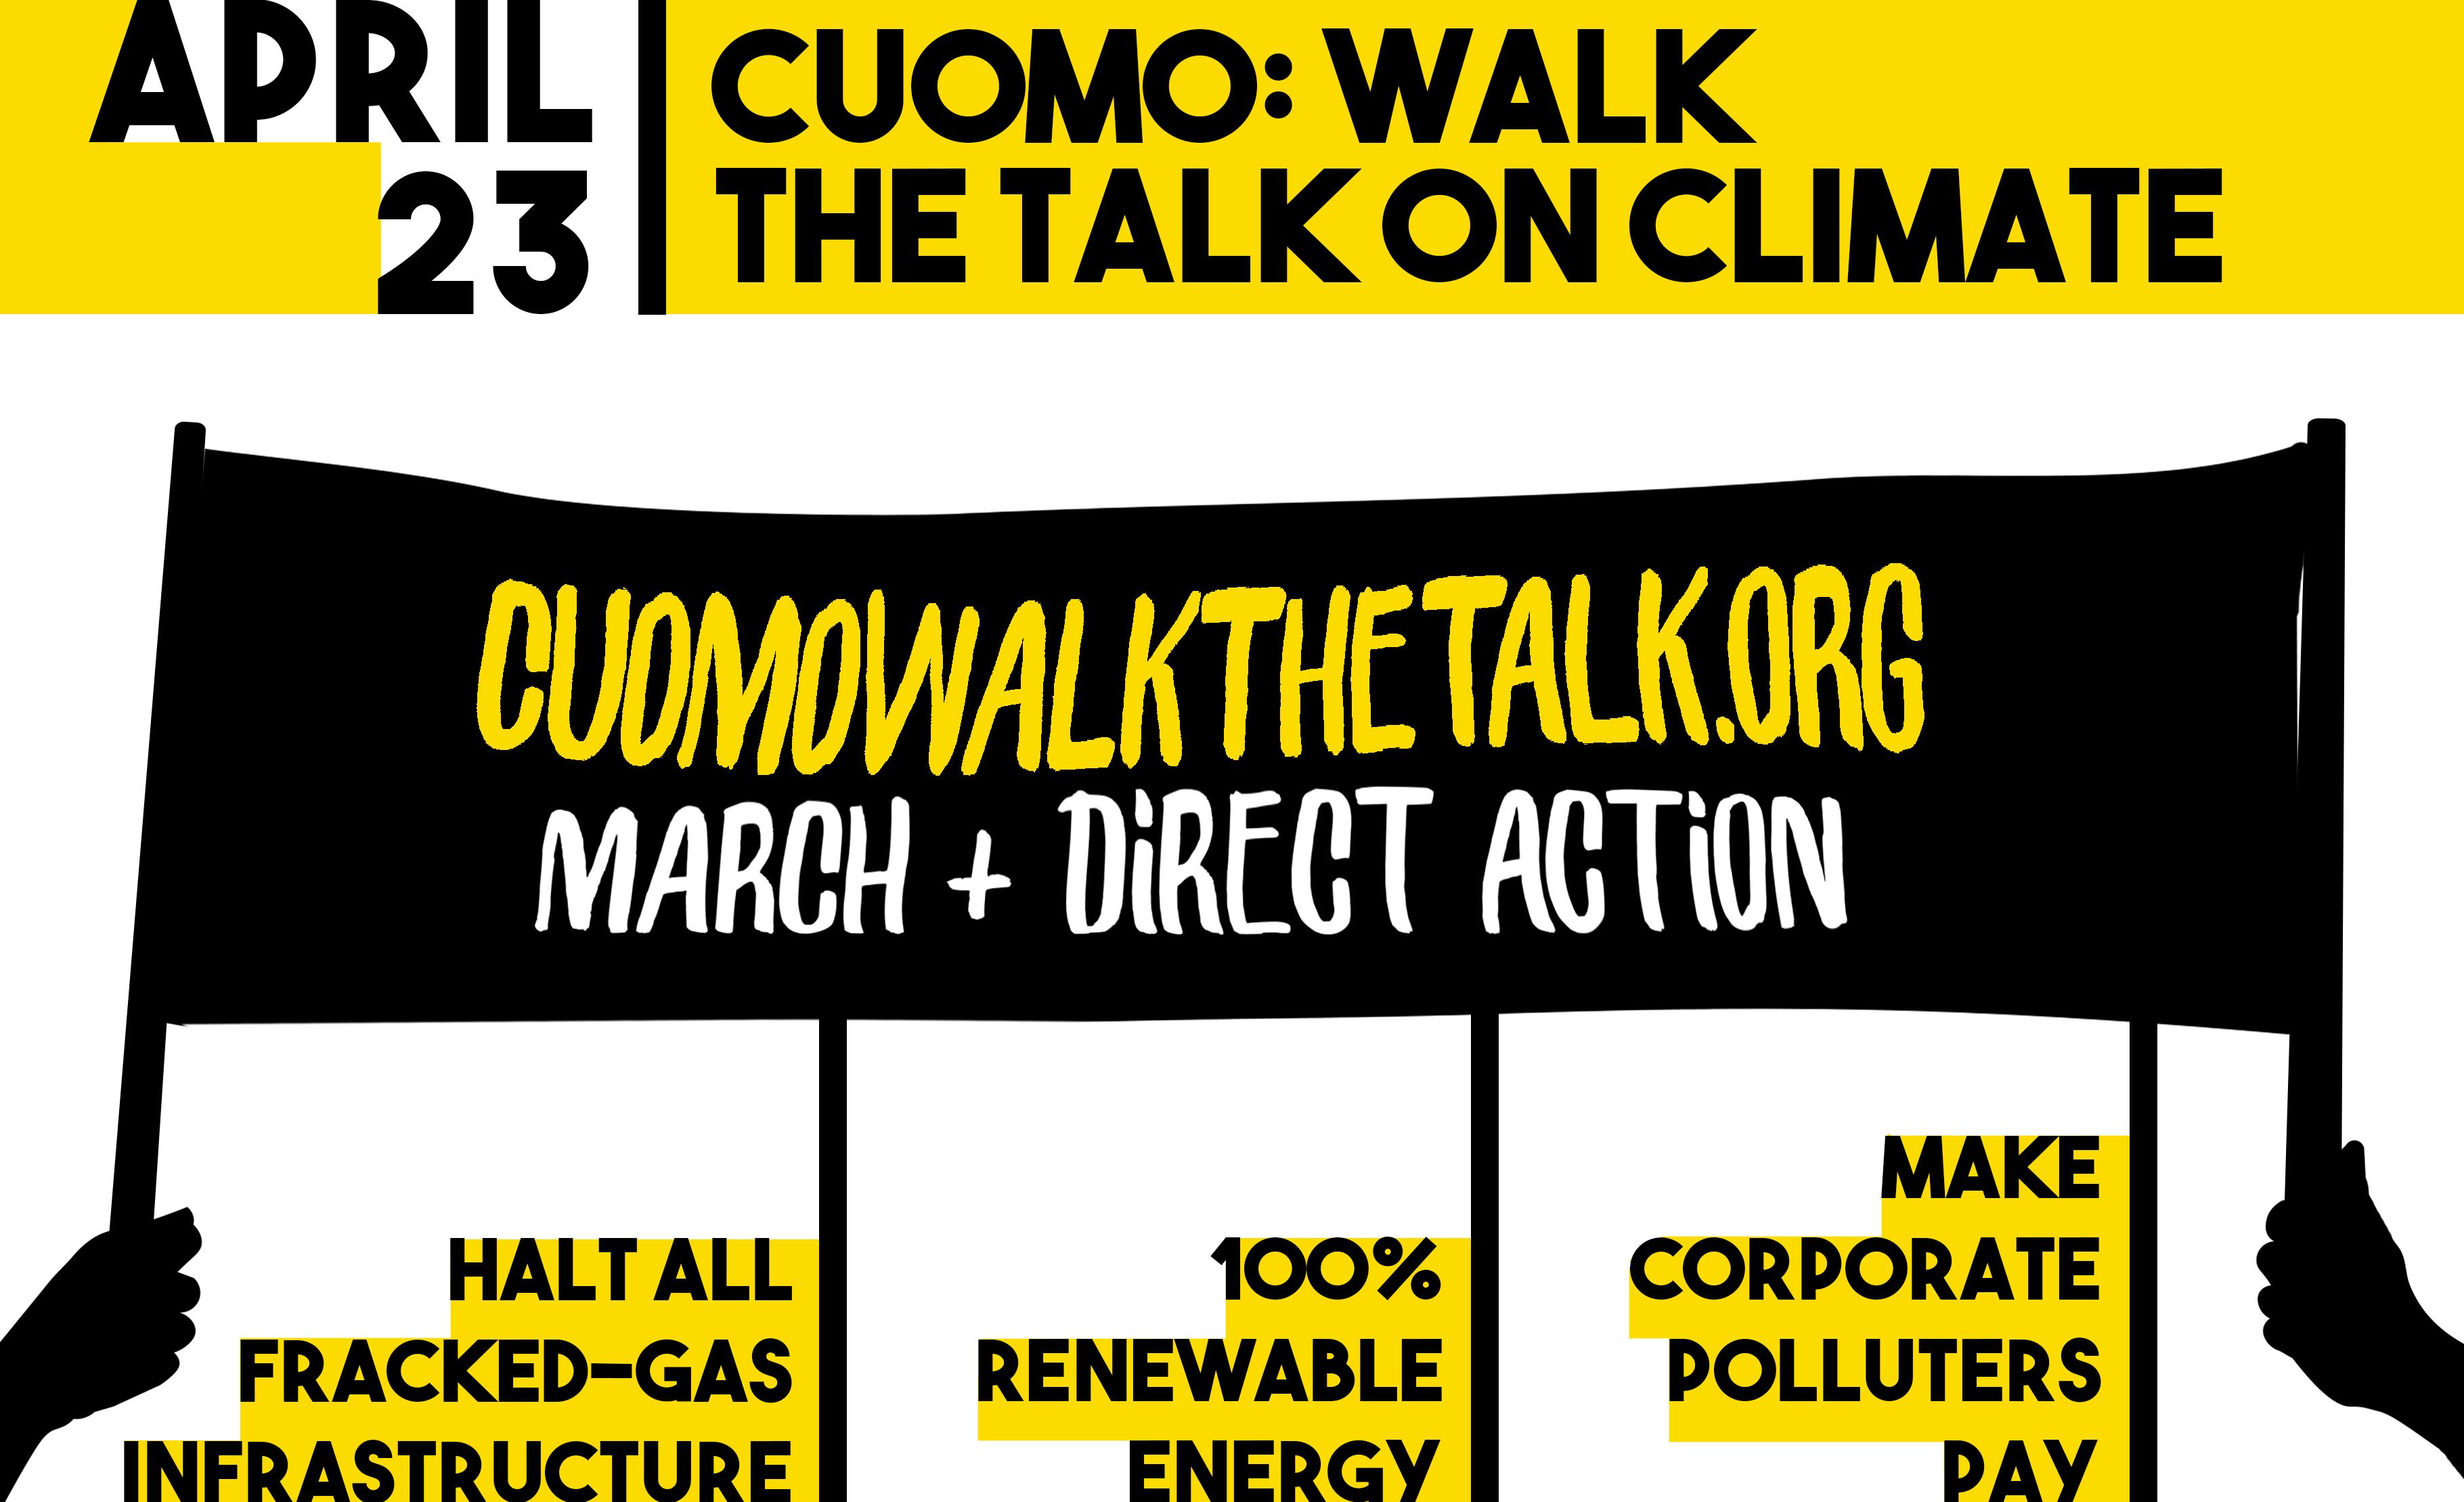 Cuomo walk the talk